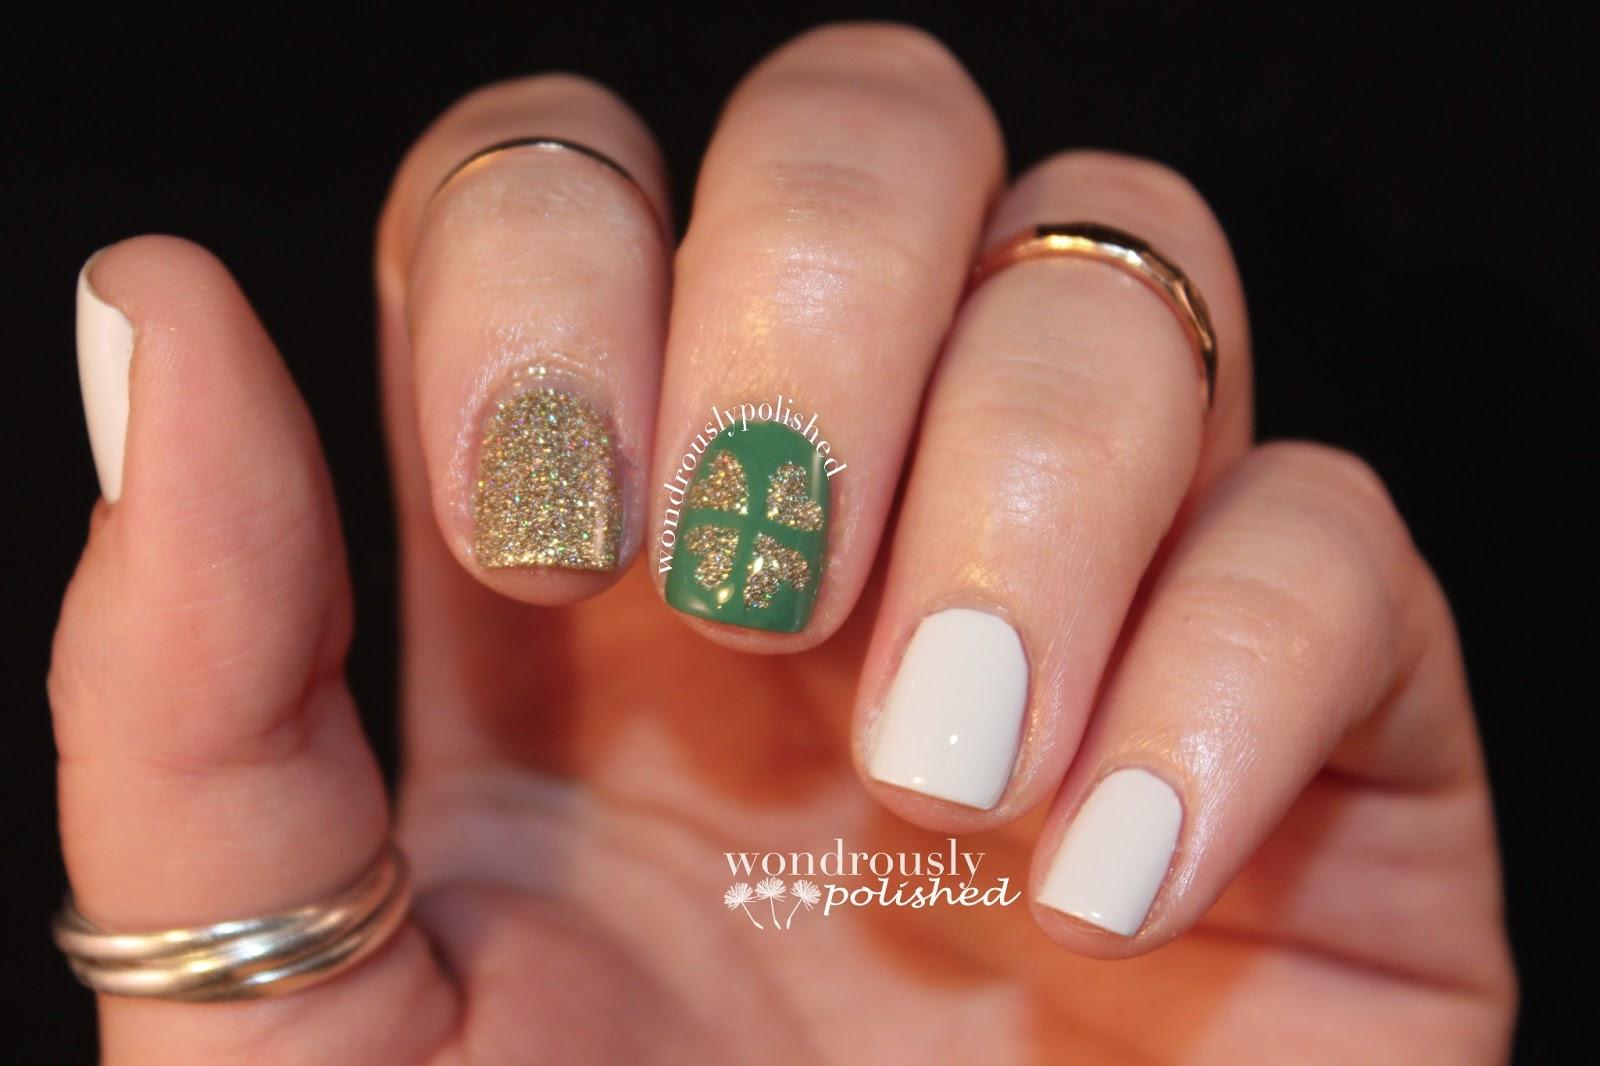 Wondrously Polished: March Nail Art Challenge - Day 6: St. Paddy\'s Day!